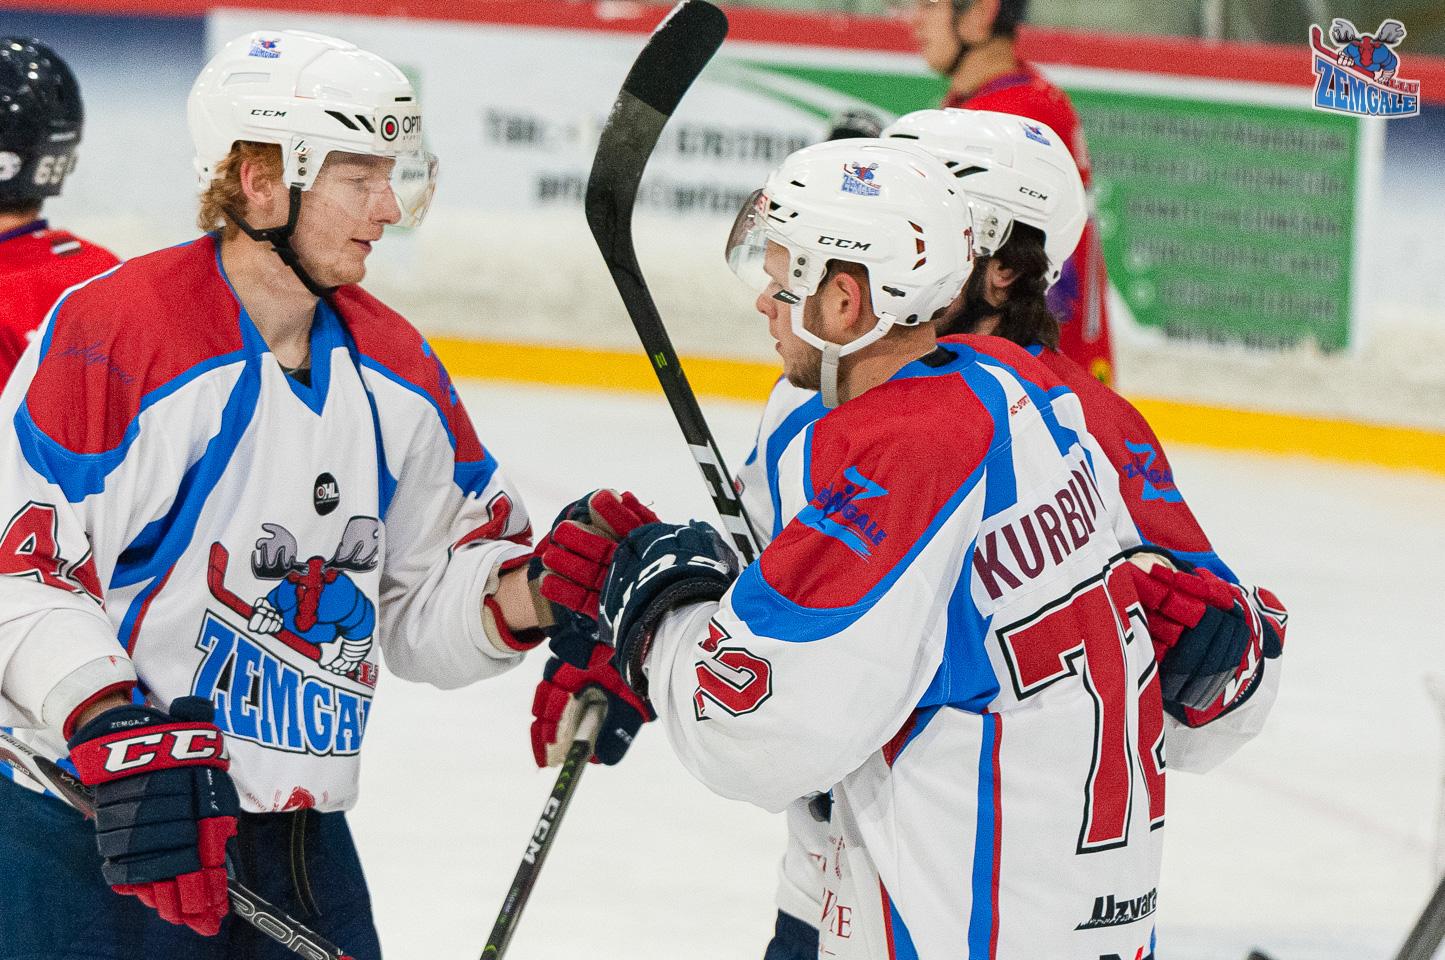 Hokejisti sveicina viens otru